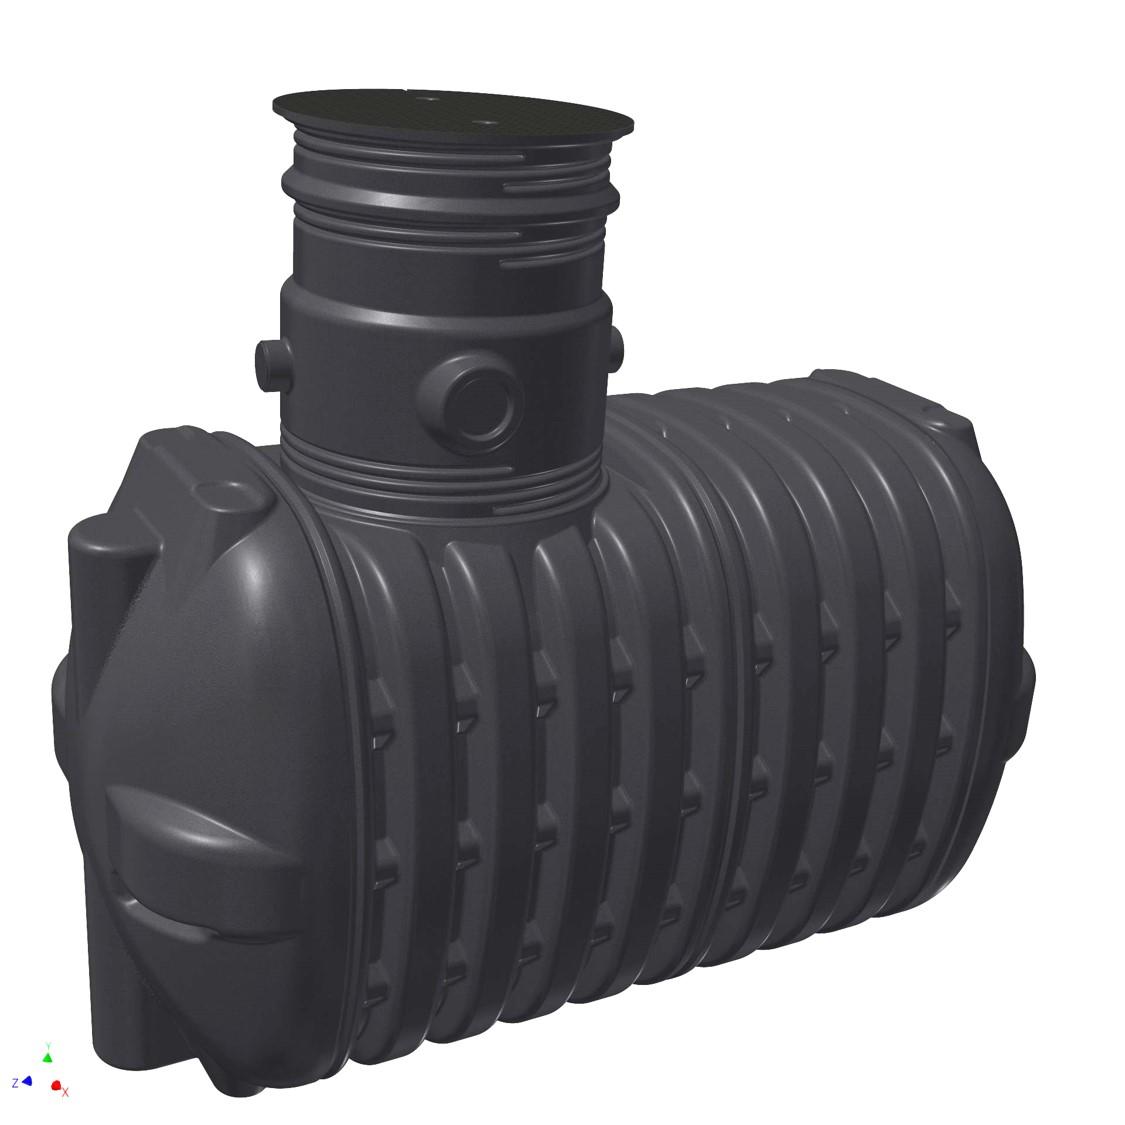 regenwasser tank zisterne erdtank speicher sl basic. Black Bedroom Furniture Sets. Home Design Ideas